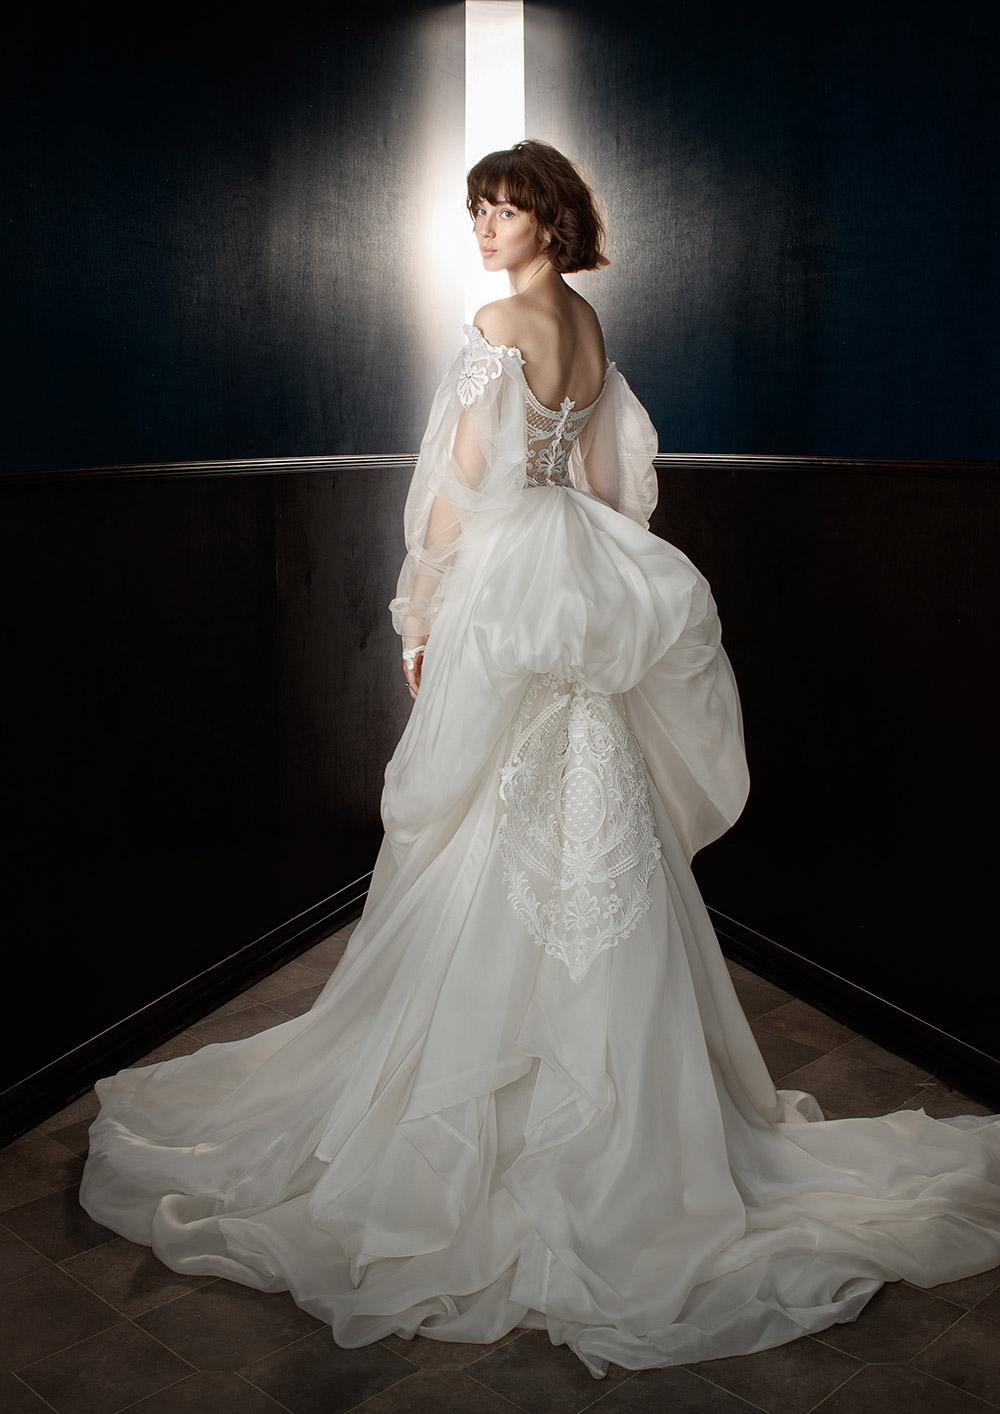 Thelma with Ossie Train - Galia Lahav Spring 2018 Bridal Collection. www.theweddingnotebook.com